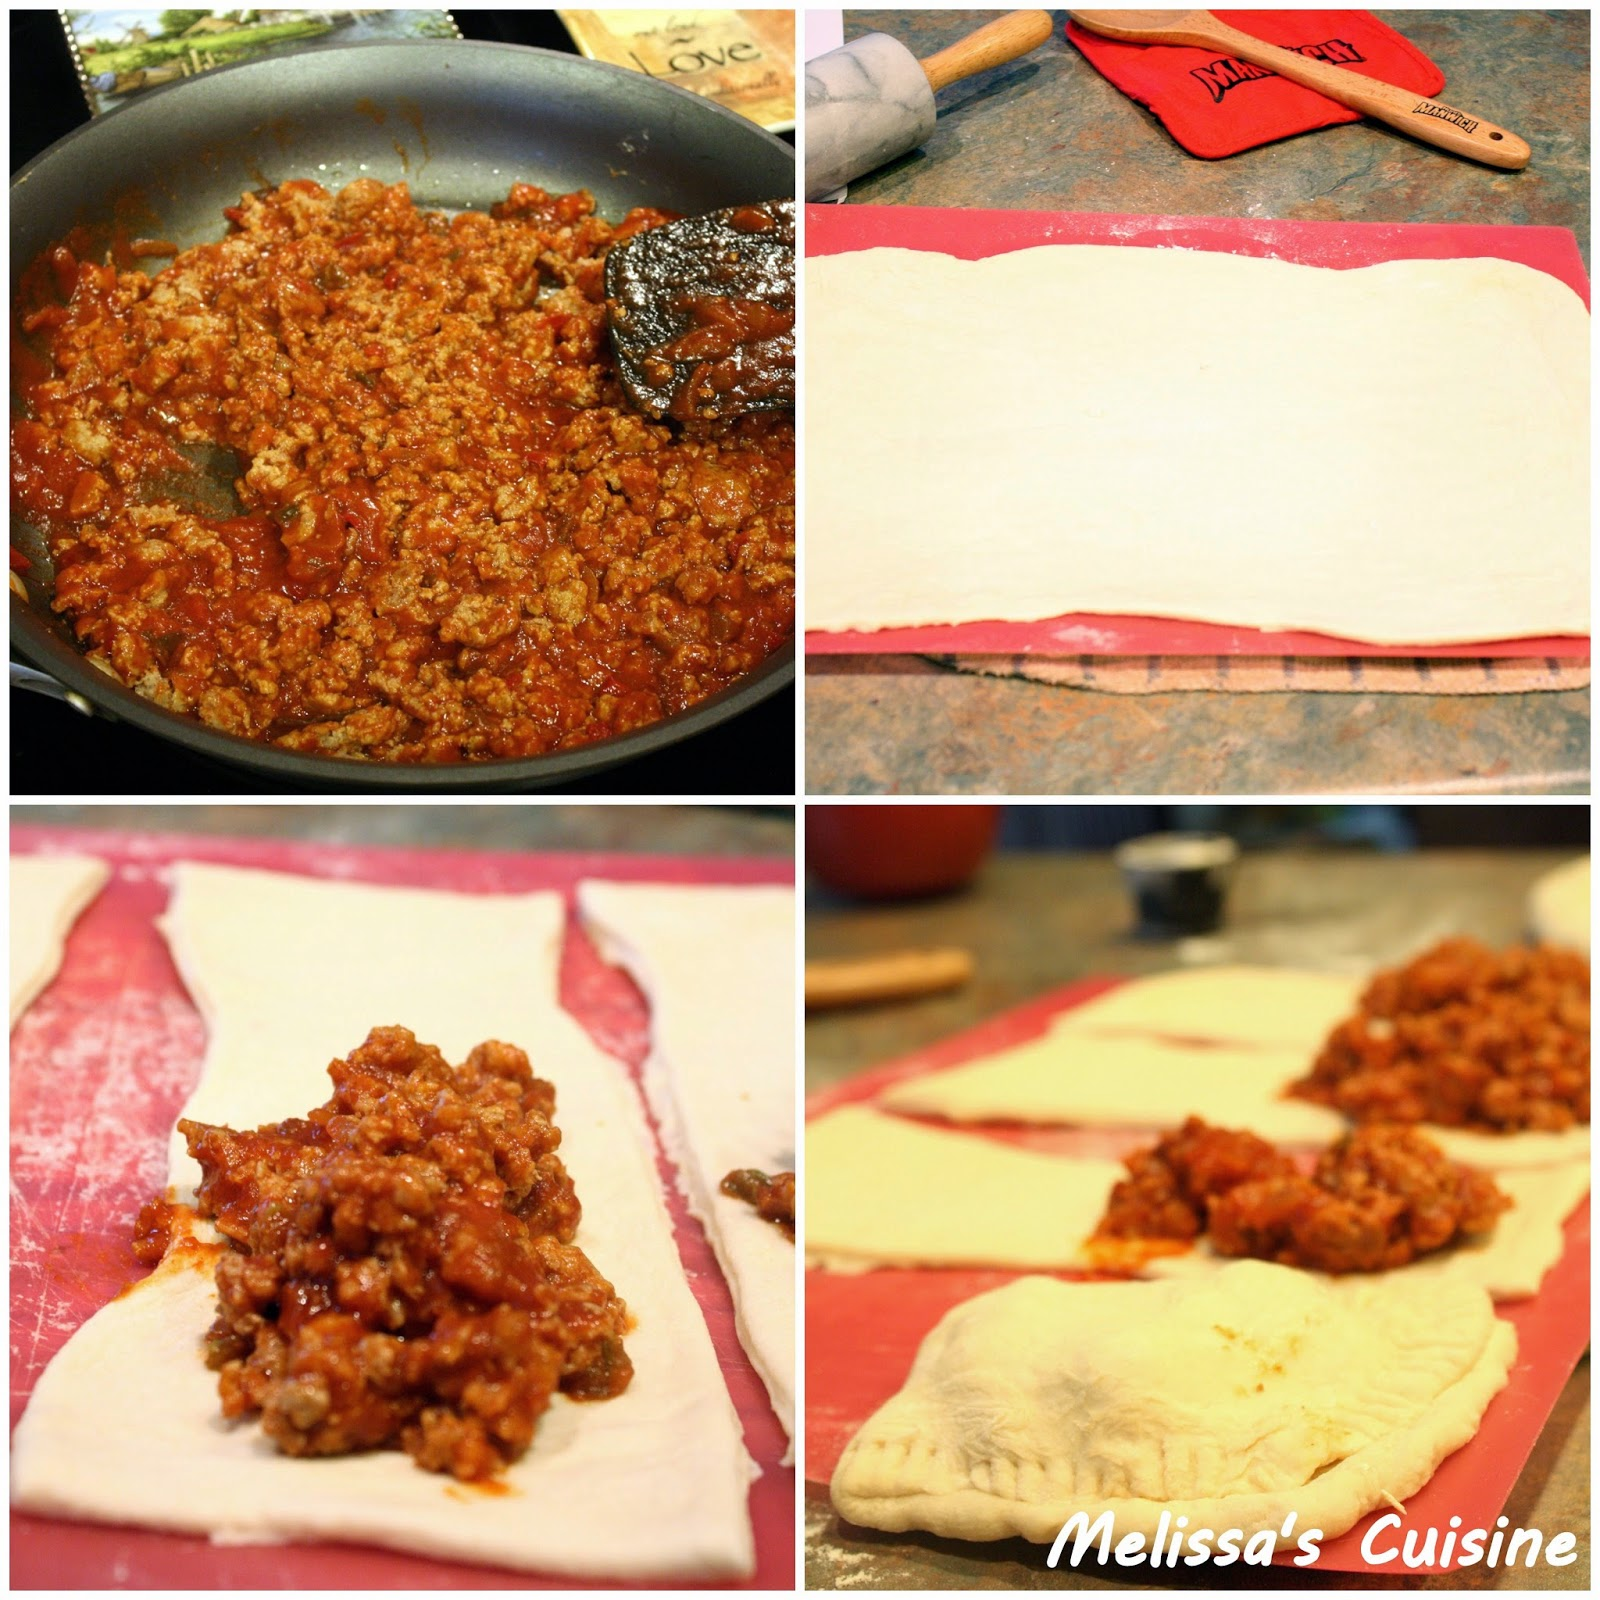 Melissa's Cuisine: Manwich Mondays